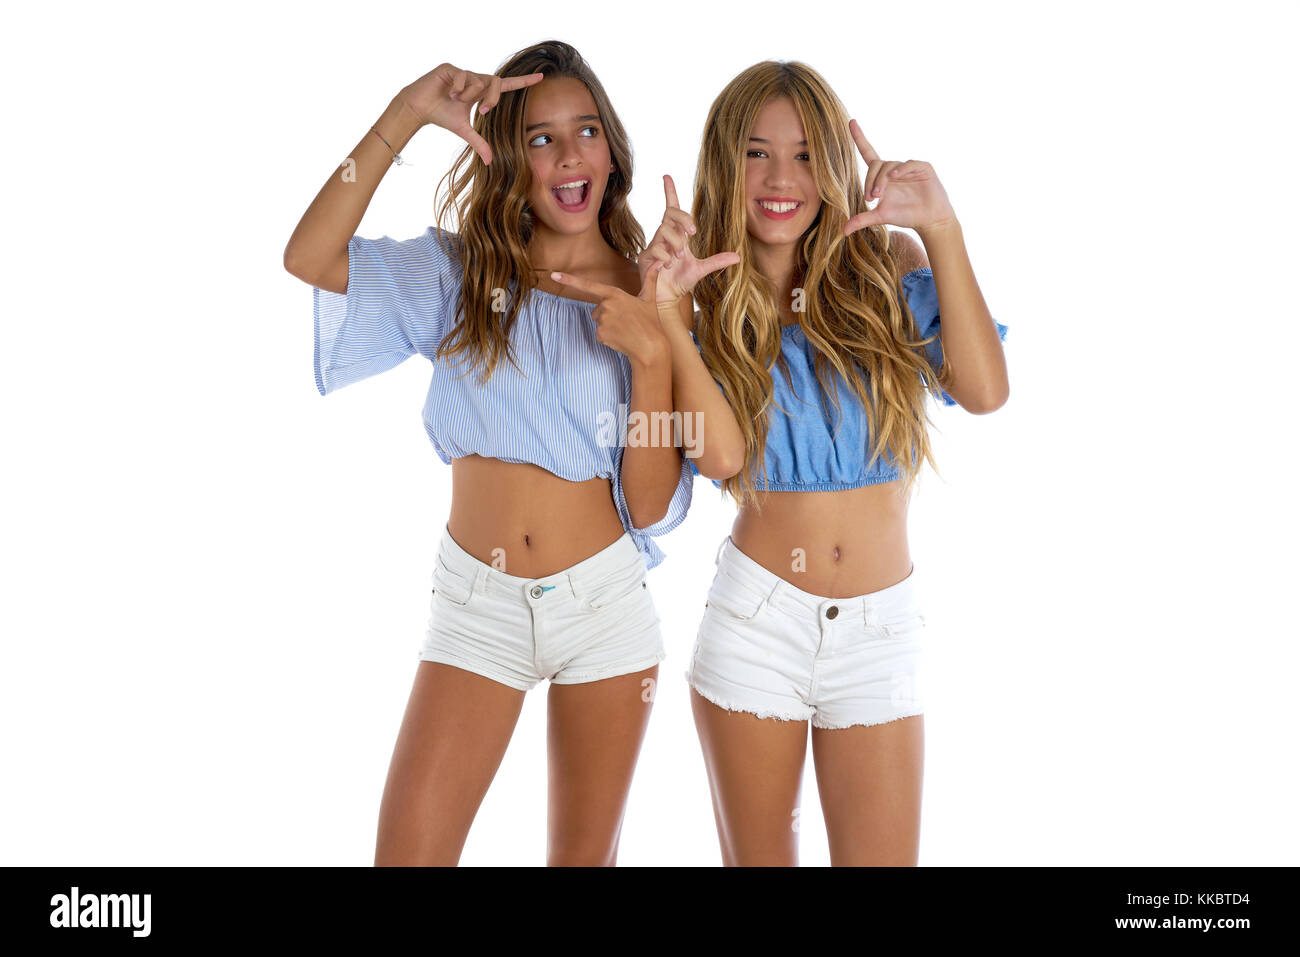 Girl Fingers Her Friend